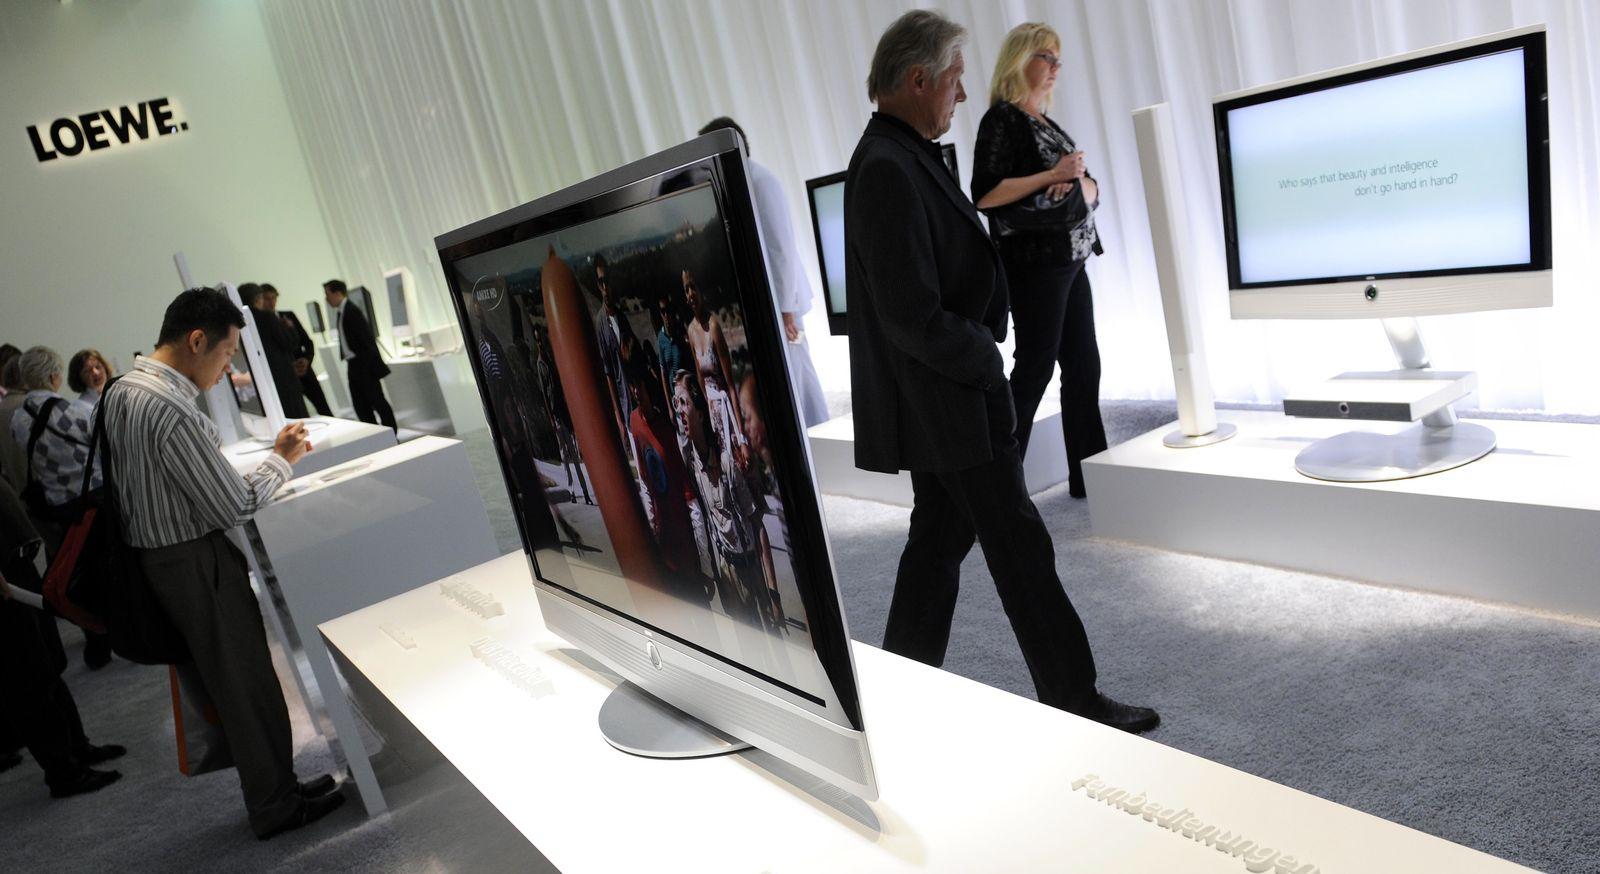 Loewe / Fernseher